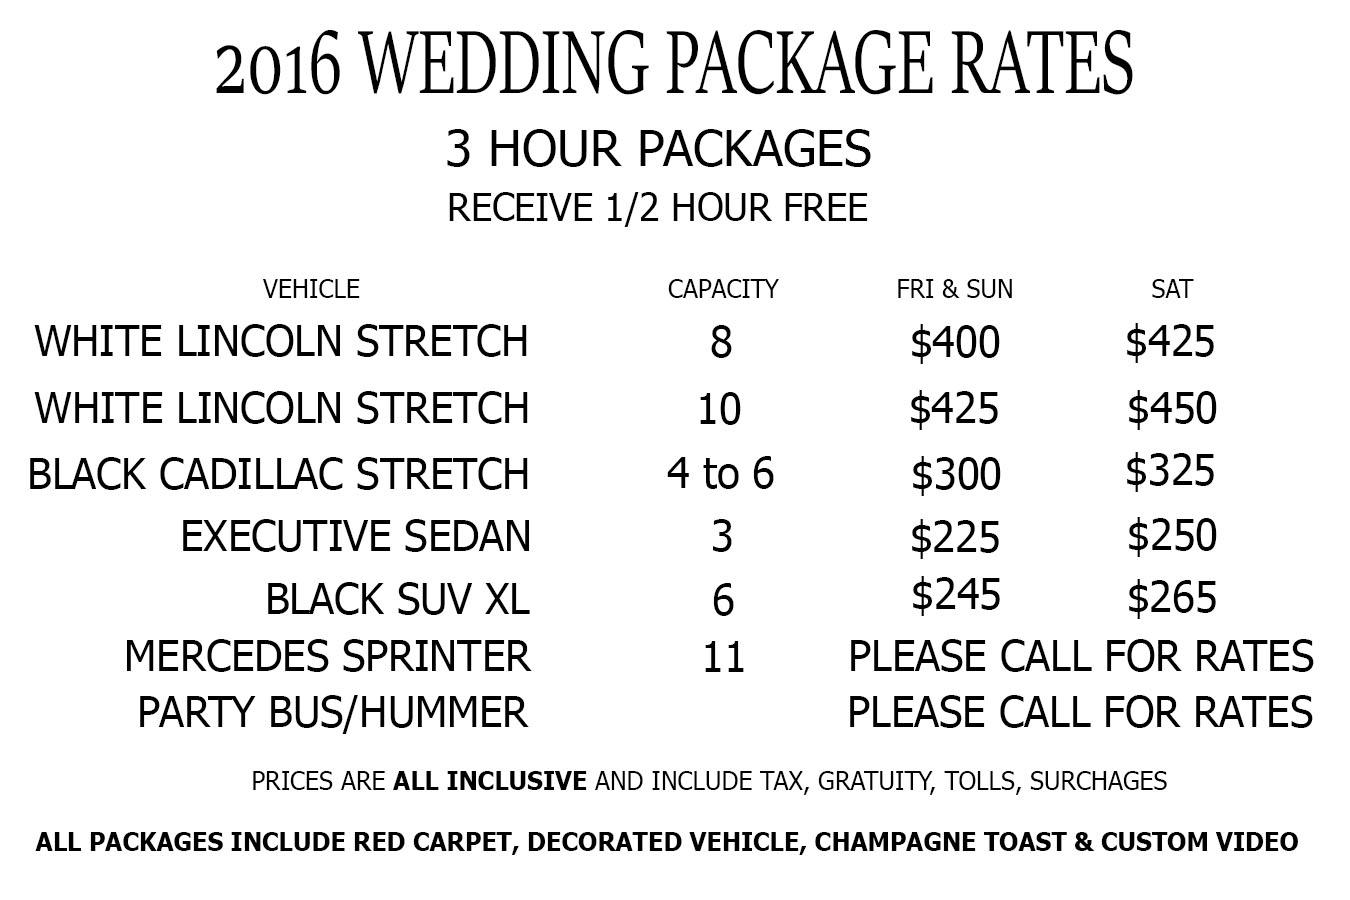 WEDDING RATES 2016